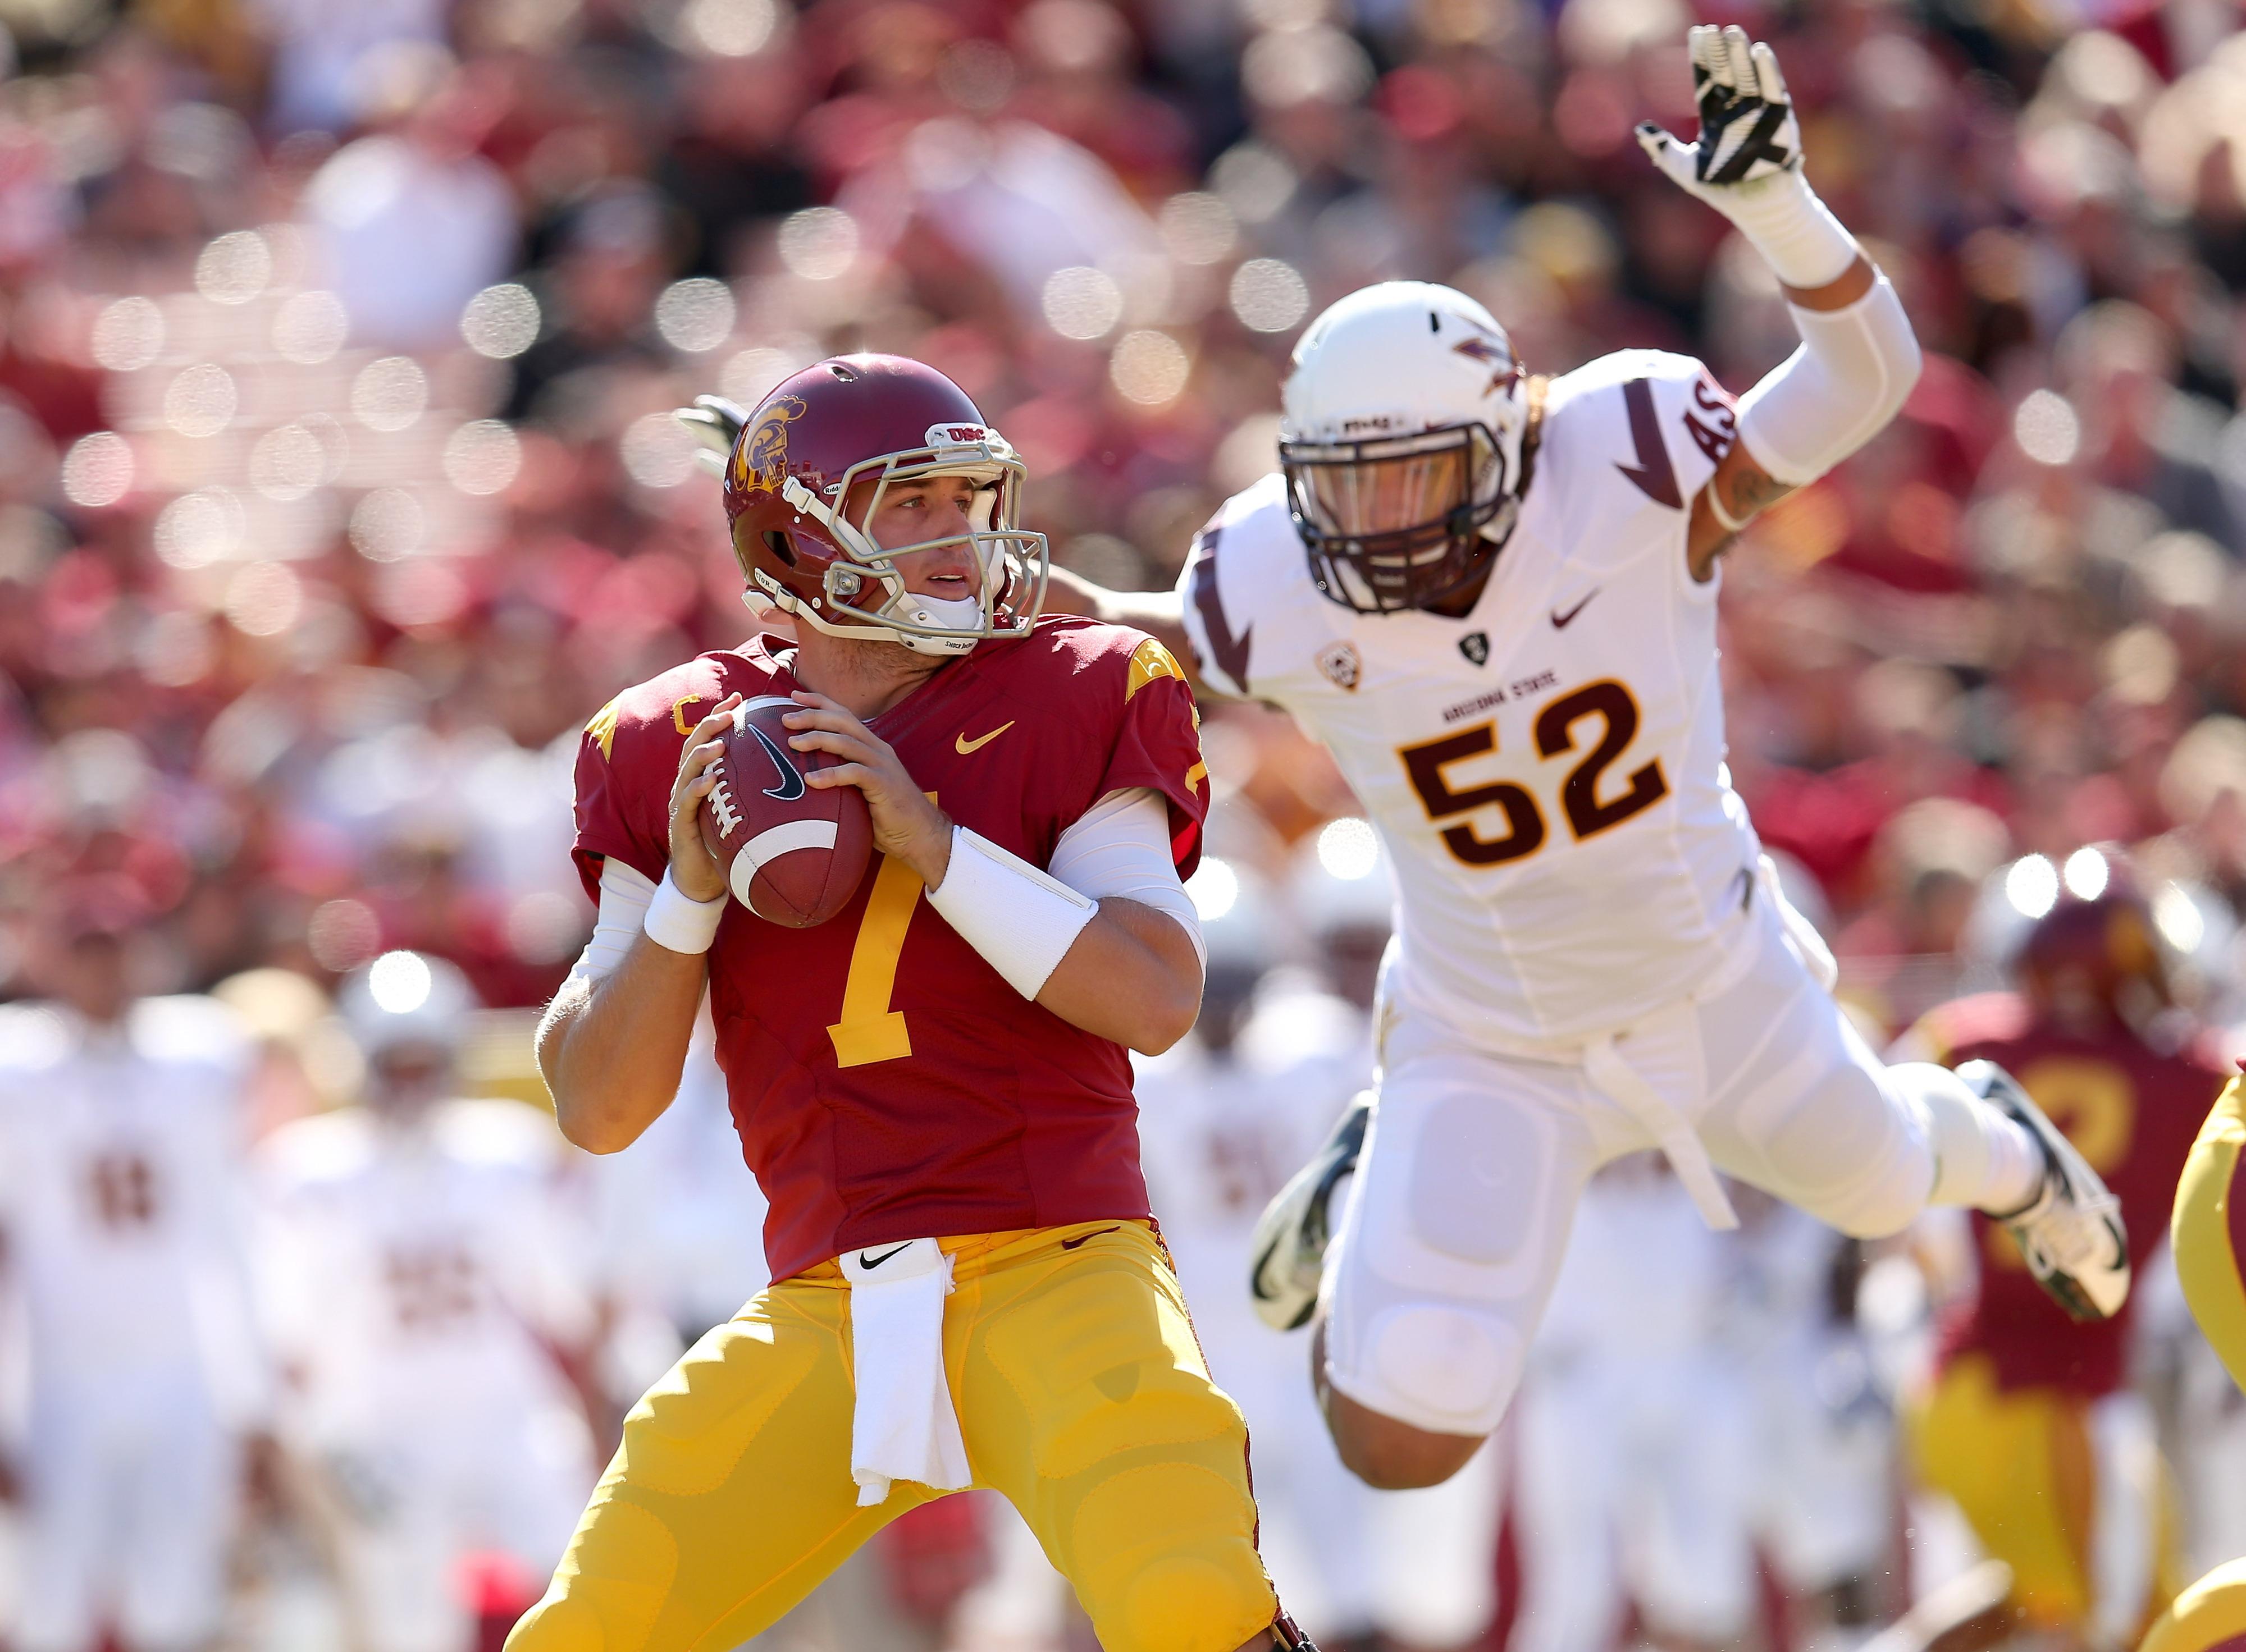 Hopefully Carl Bradford gets some chances to hit the USC quarterback.